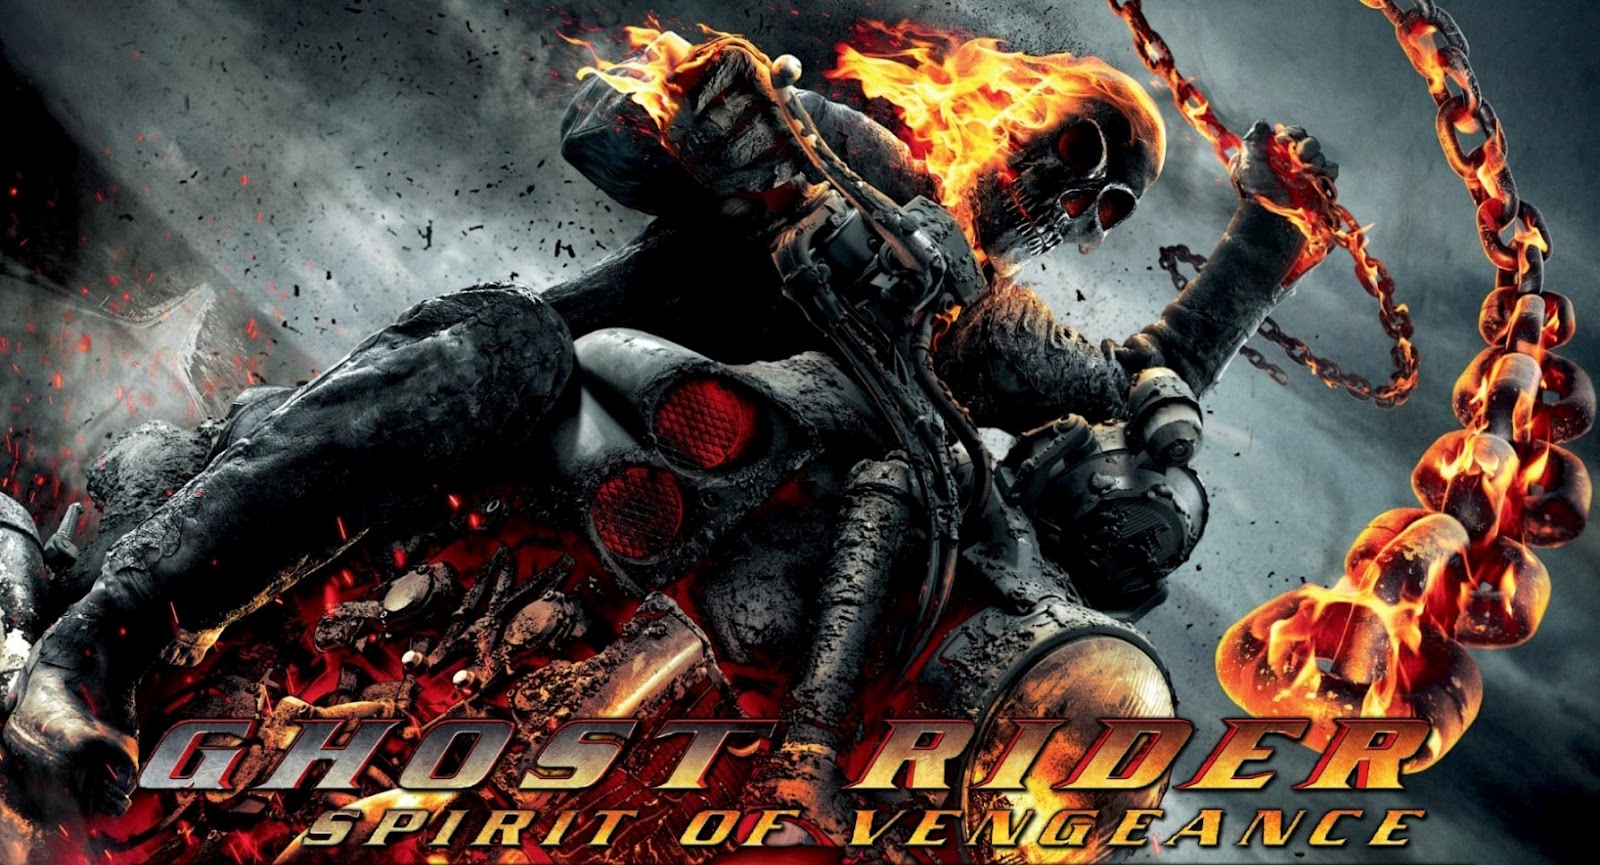 ghost rider 2 spirit of vengeance full movie watch online ~ latest